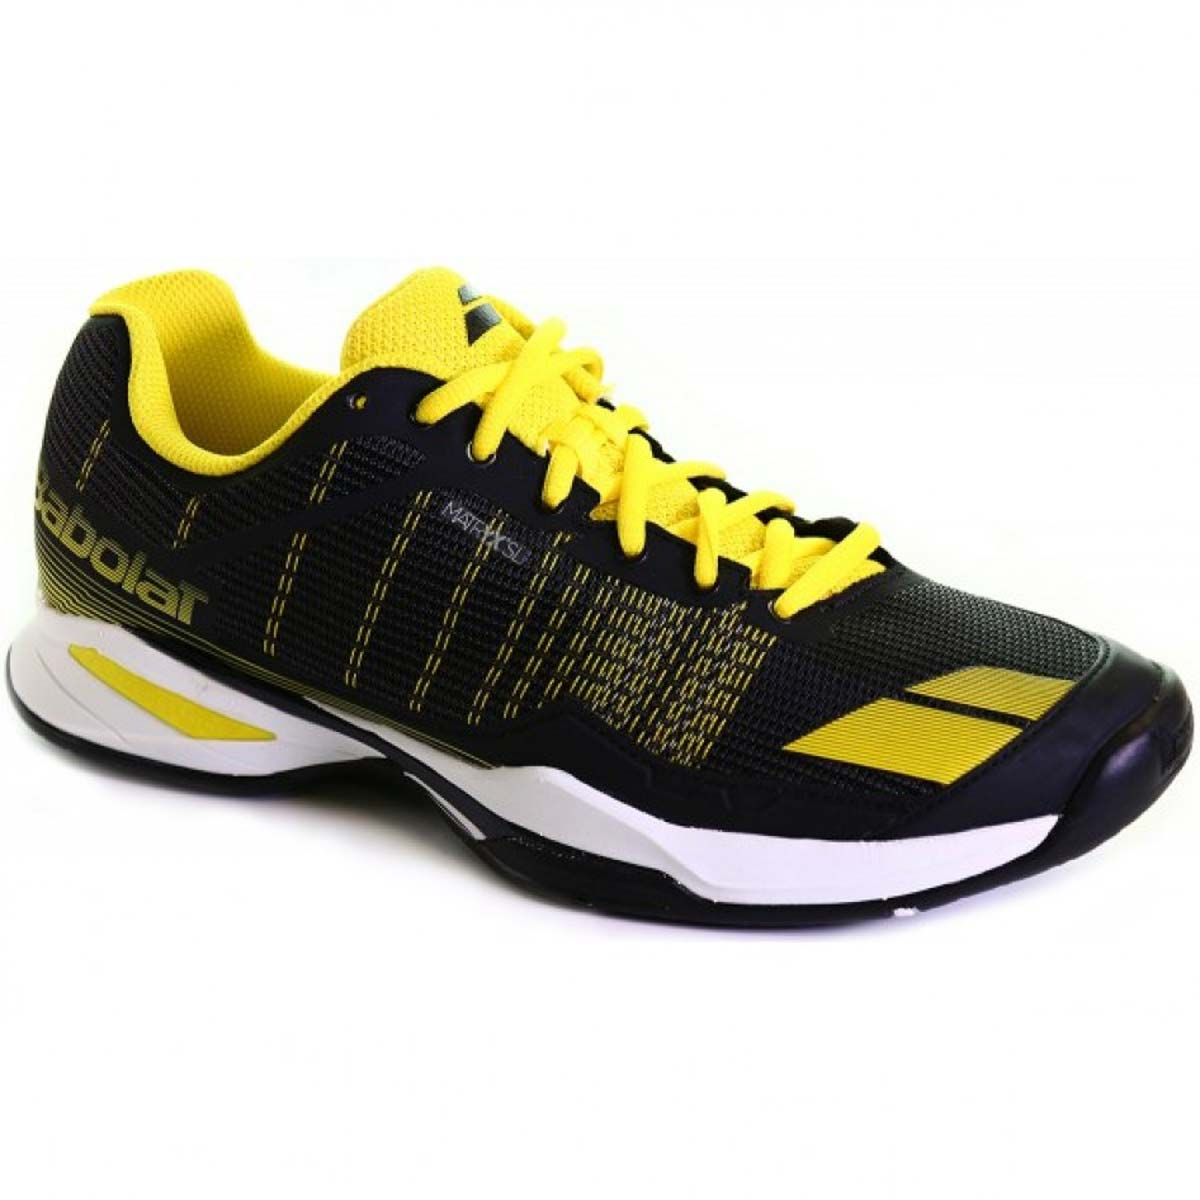 ef04b5f0792c4 Babolat Jet Team All Court Mens Tennis Shoes (Black/Yellow)